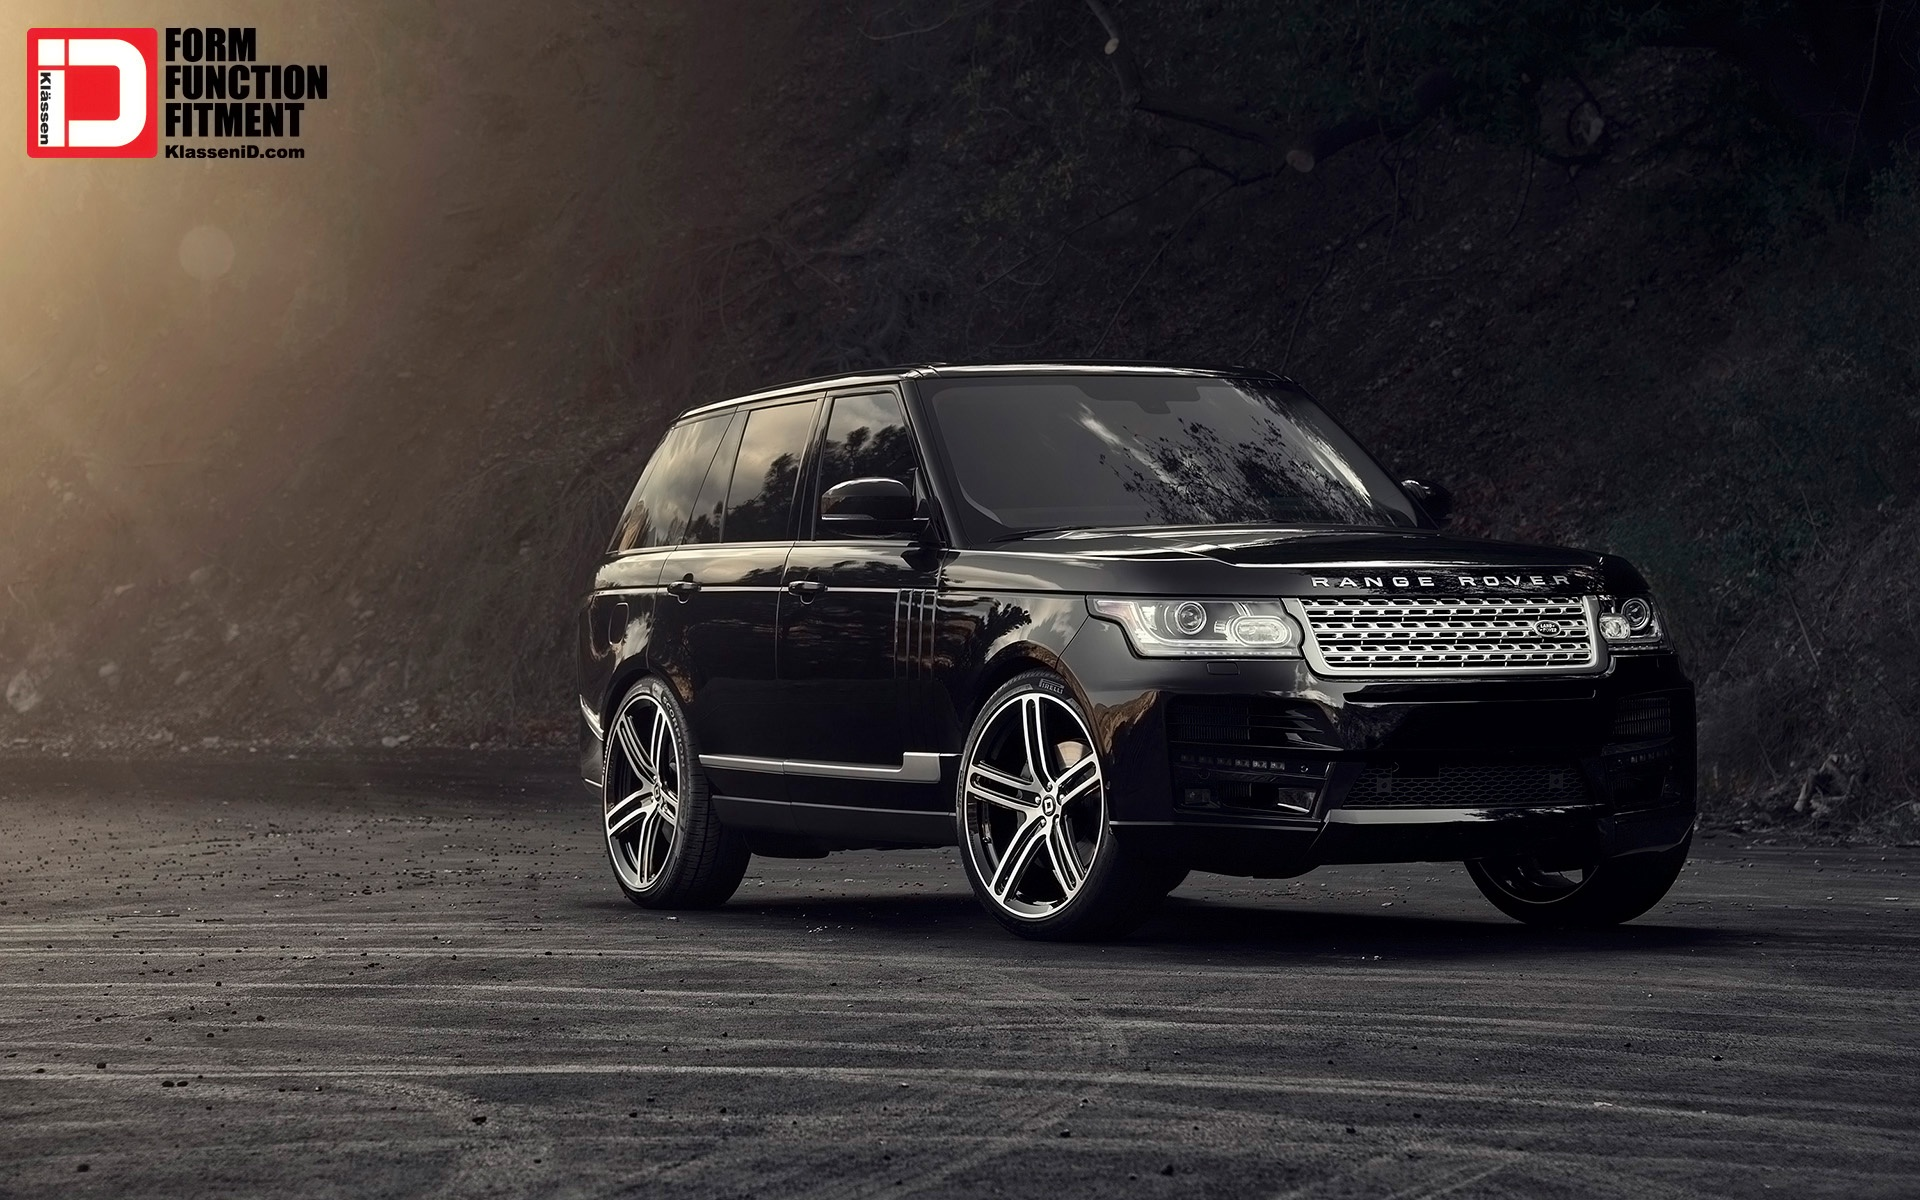 Range Rover Sport Iphone Wallpaper: Range Rover Sport Wallpapers For Iphone , Iphone Plus